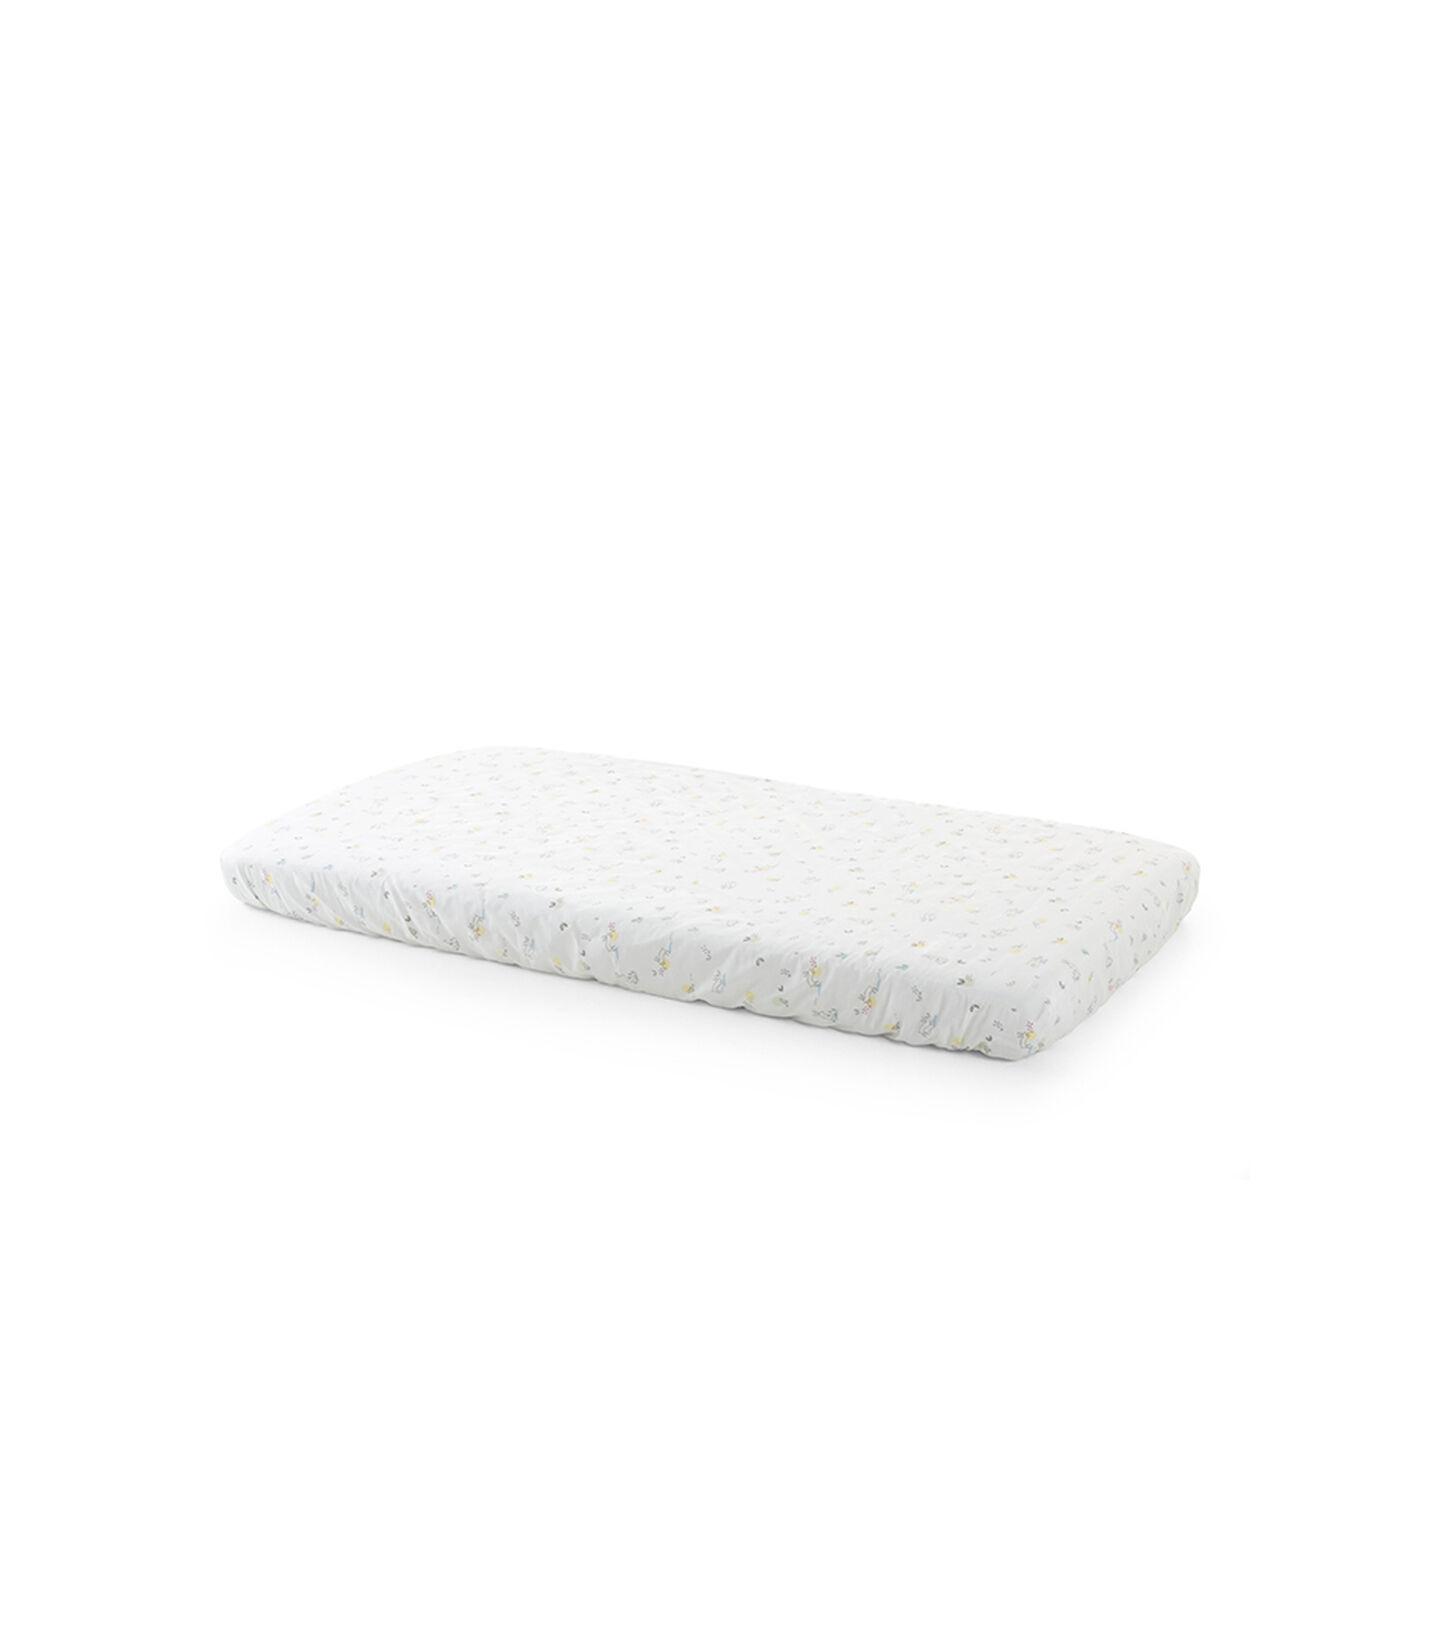 Stokke® Home™ Bed Fitted Sheet - prześcieradło, 2 szt. - Soft Rabbit, Soft Rabbit, mainview view 2